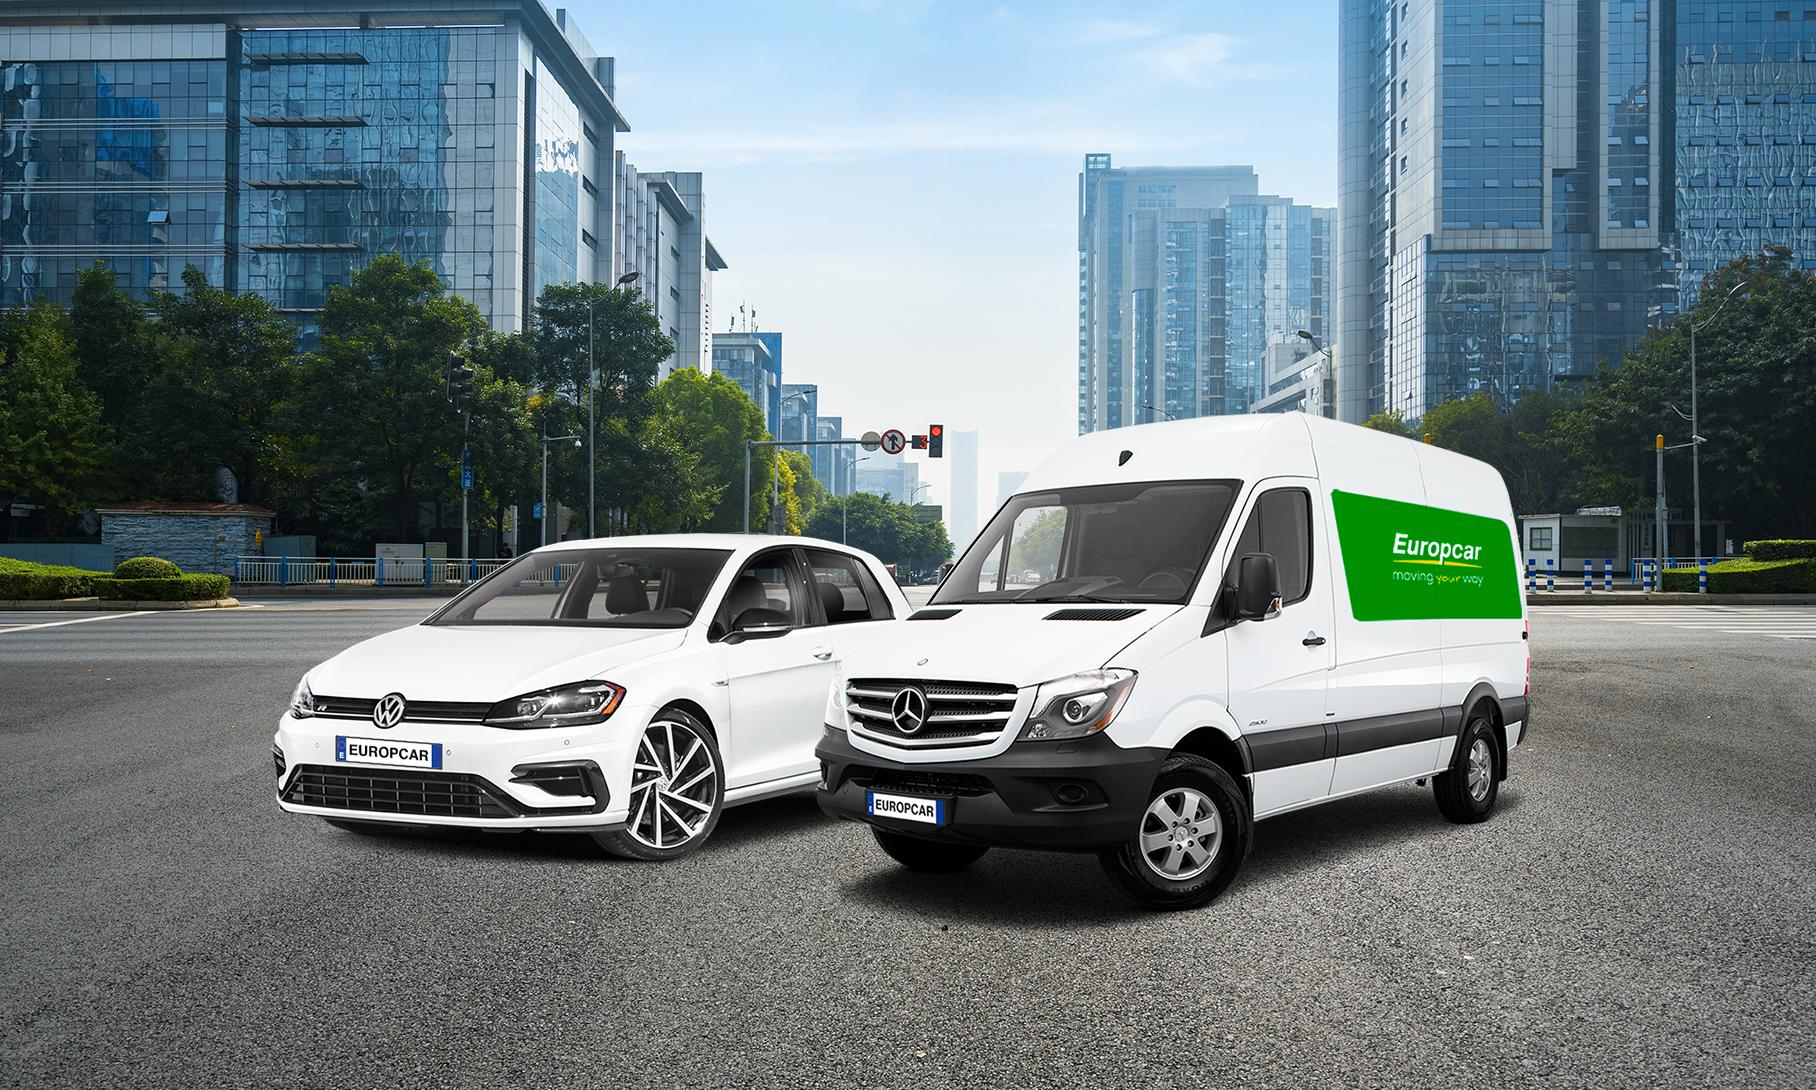 Europcar Launches DuoFlex Business Subscription Service